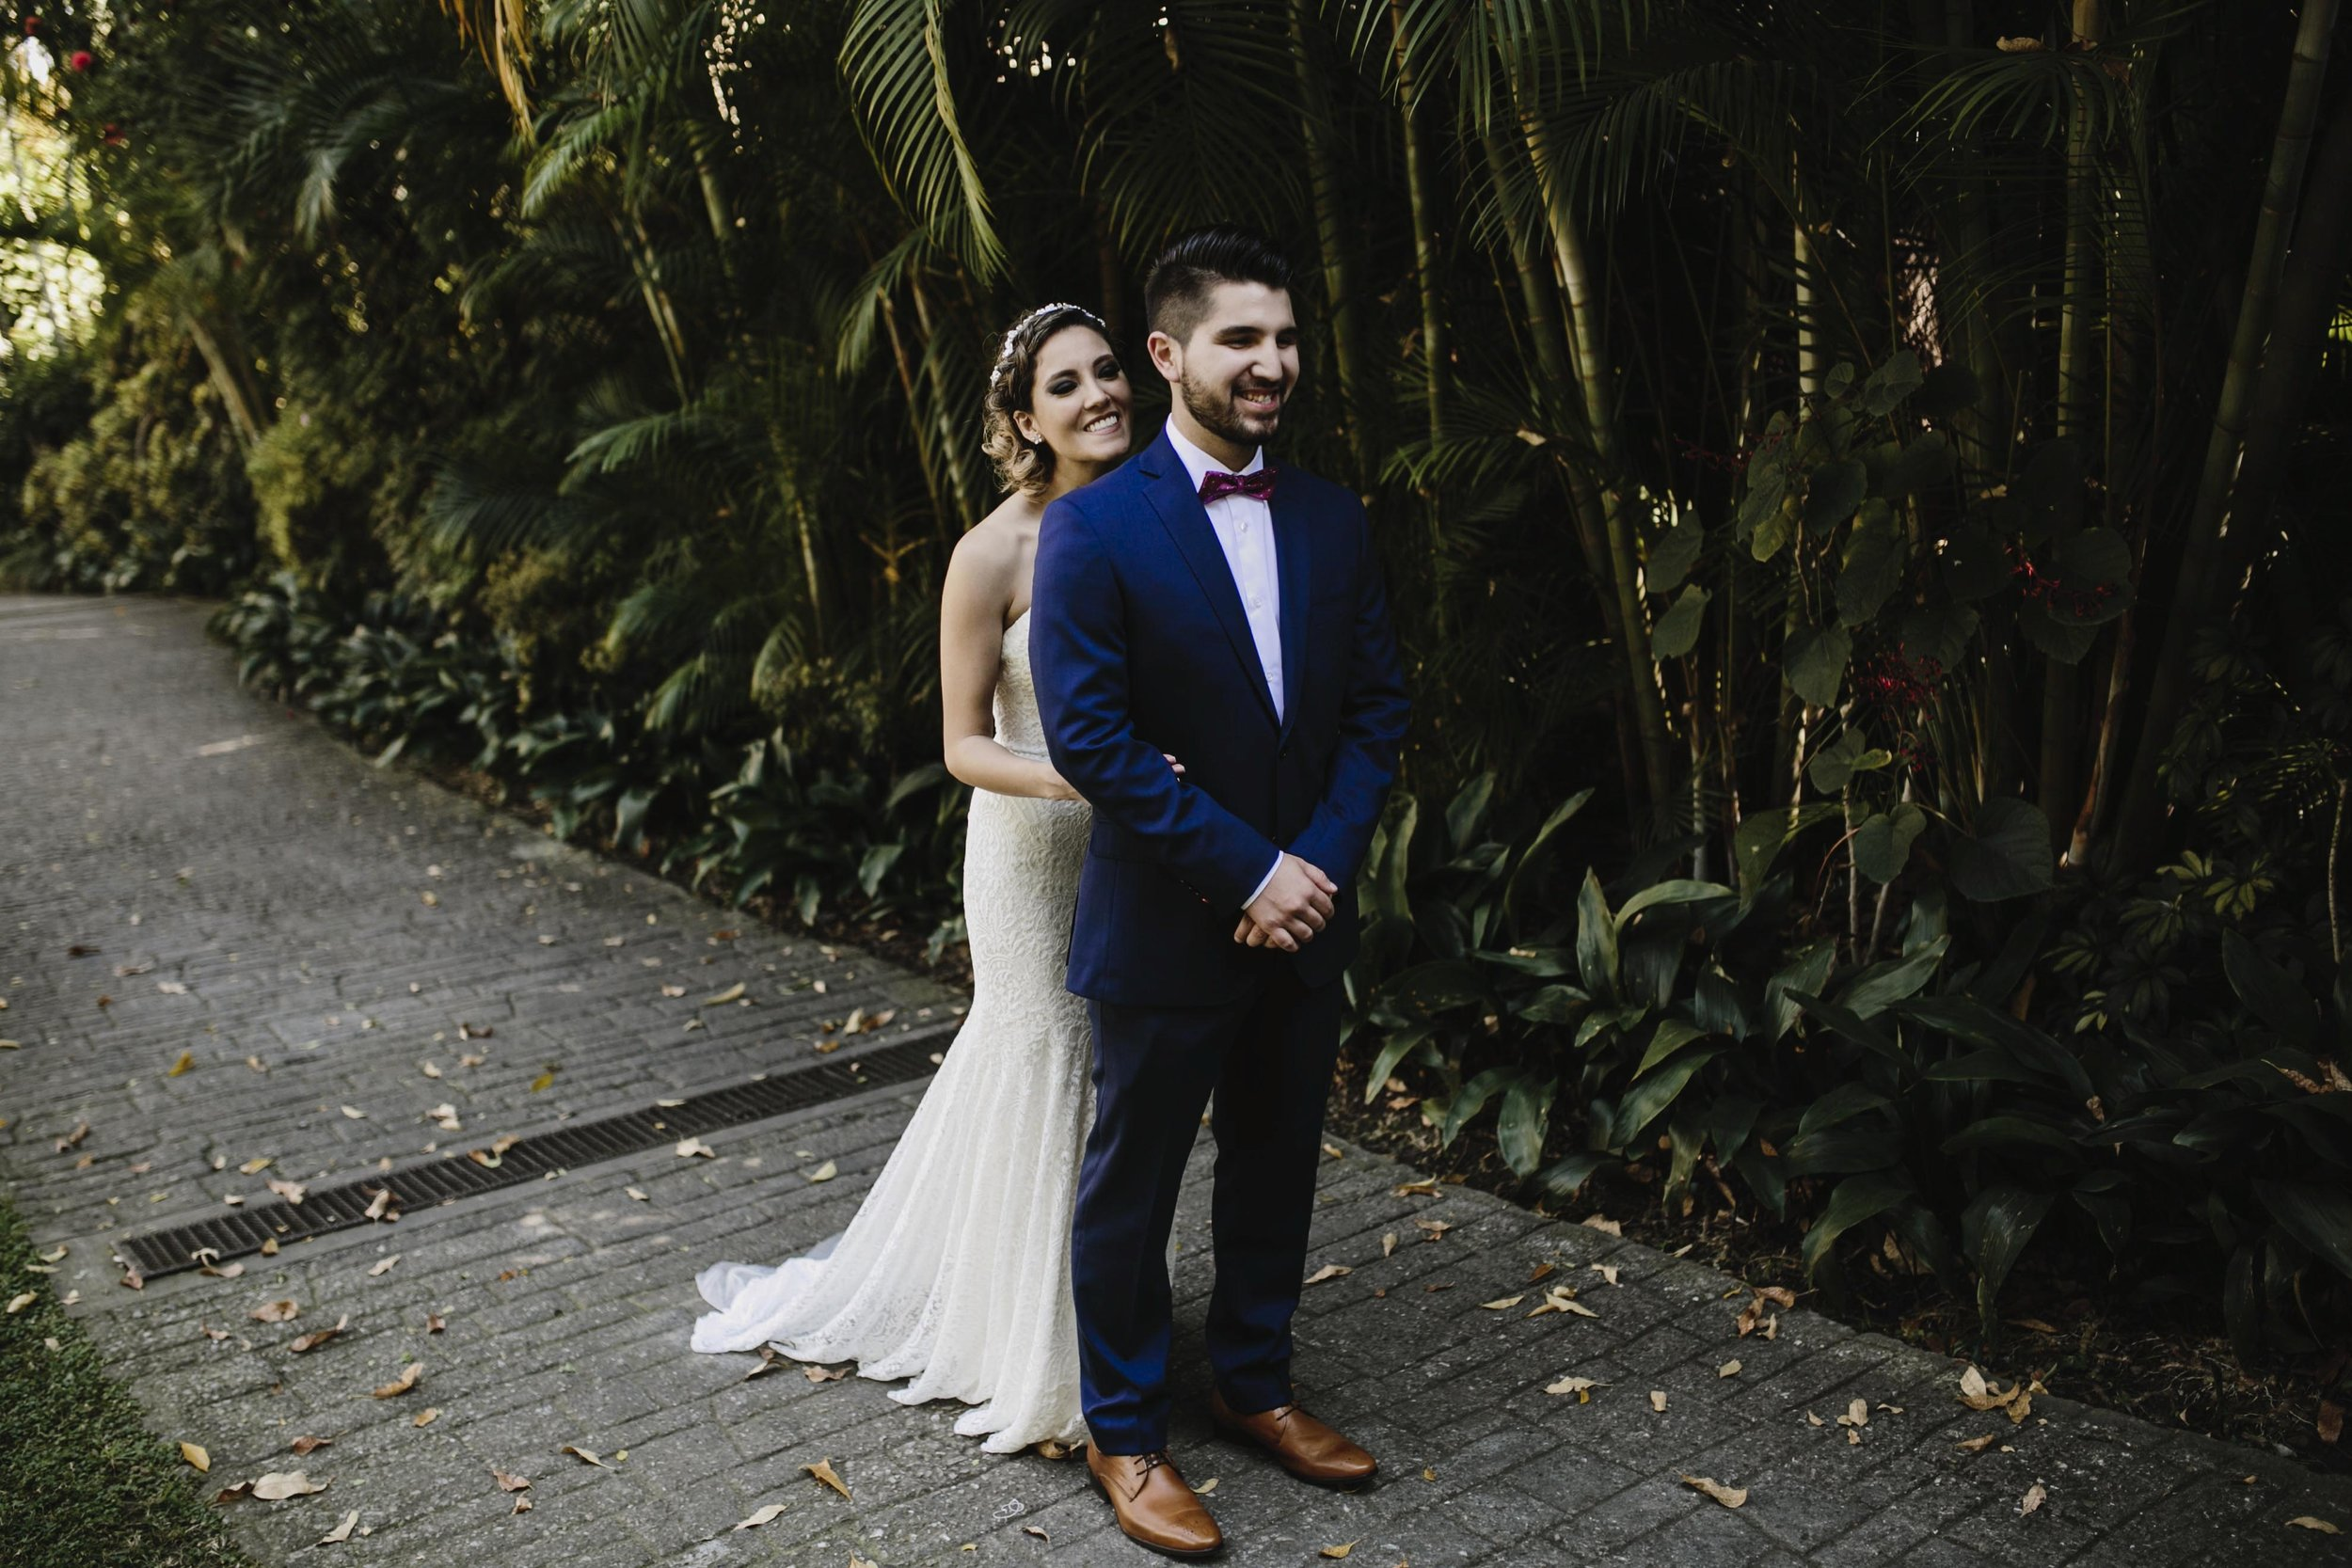 alfonso_flores_destination_wedding_photography_jardin_amarello_cuernavaca44.jpg